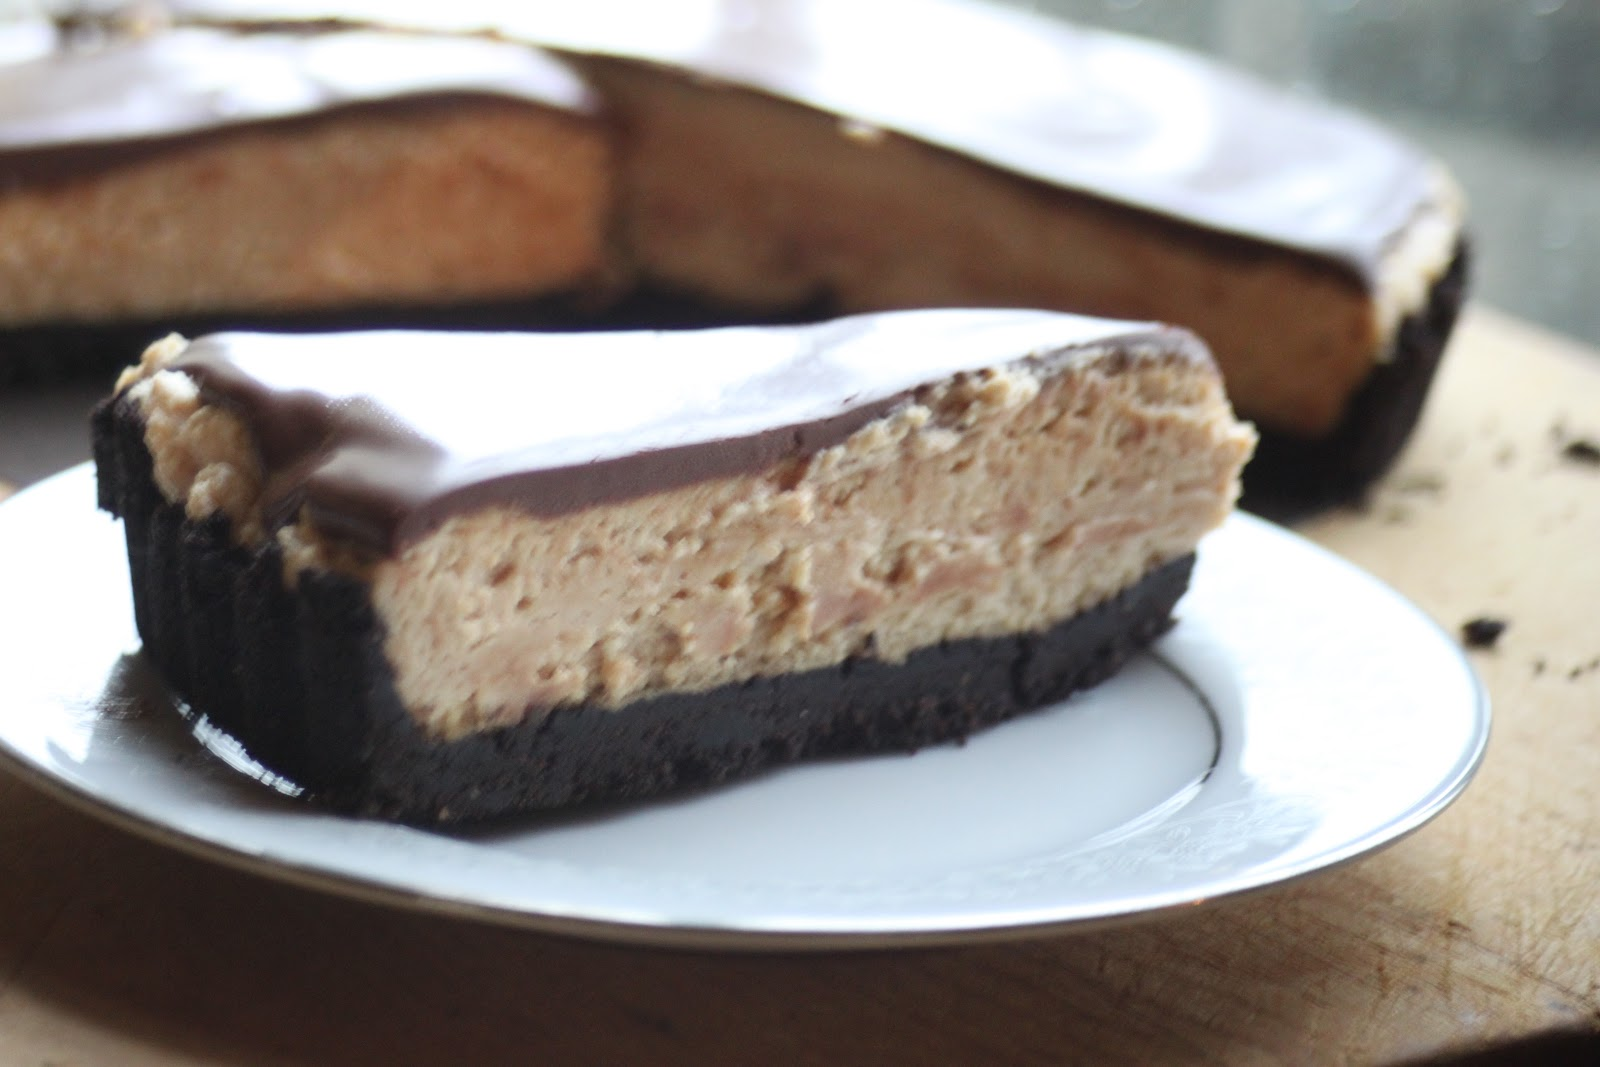 Good Clean Fun: Chocolate Peanut Butter Pie